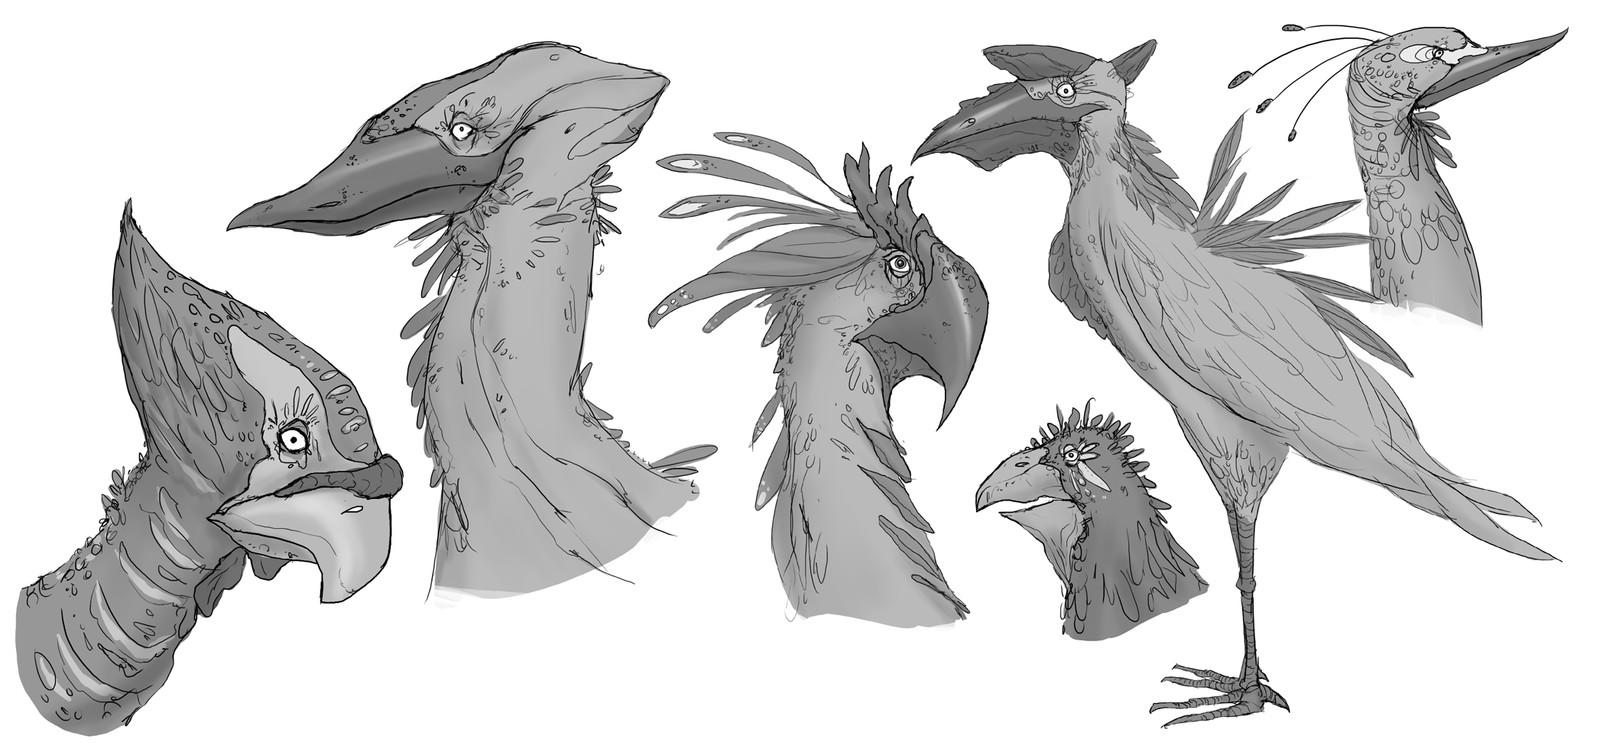 Fantasy bird concepts